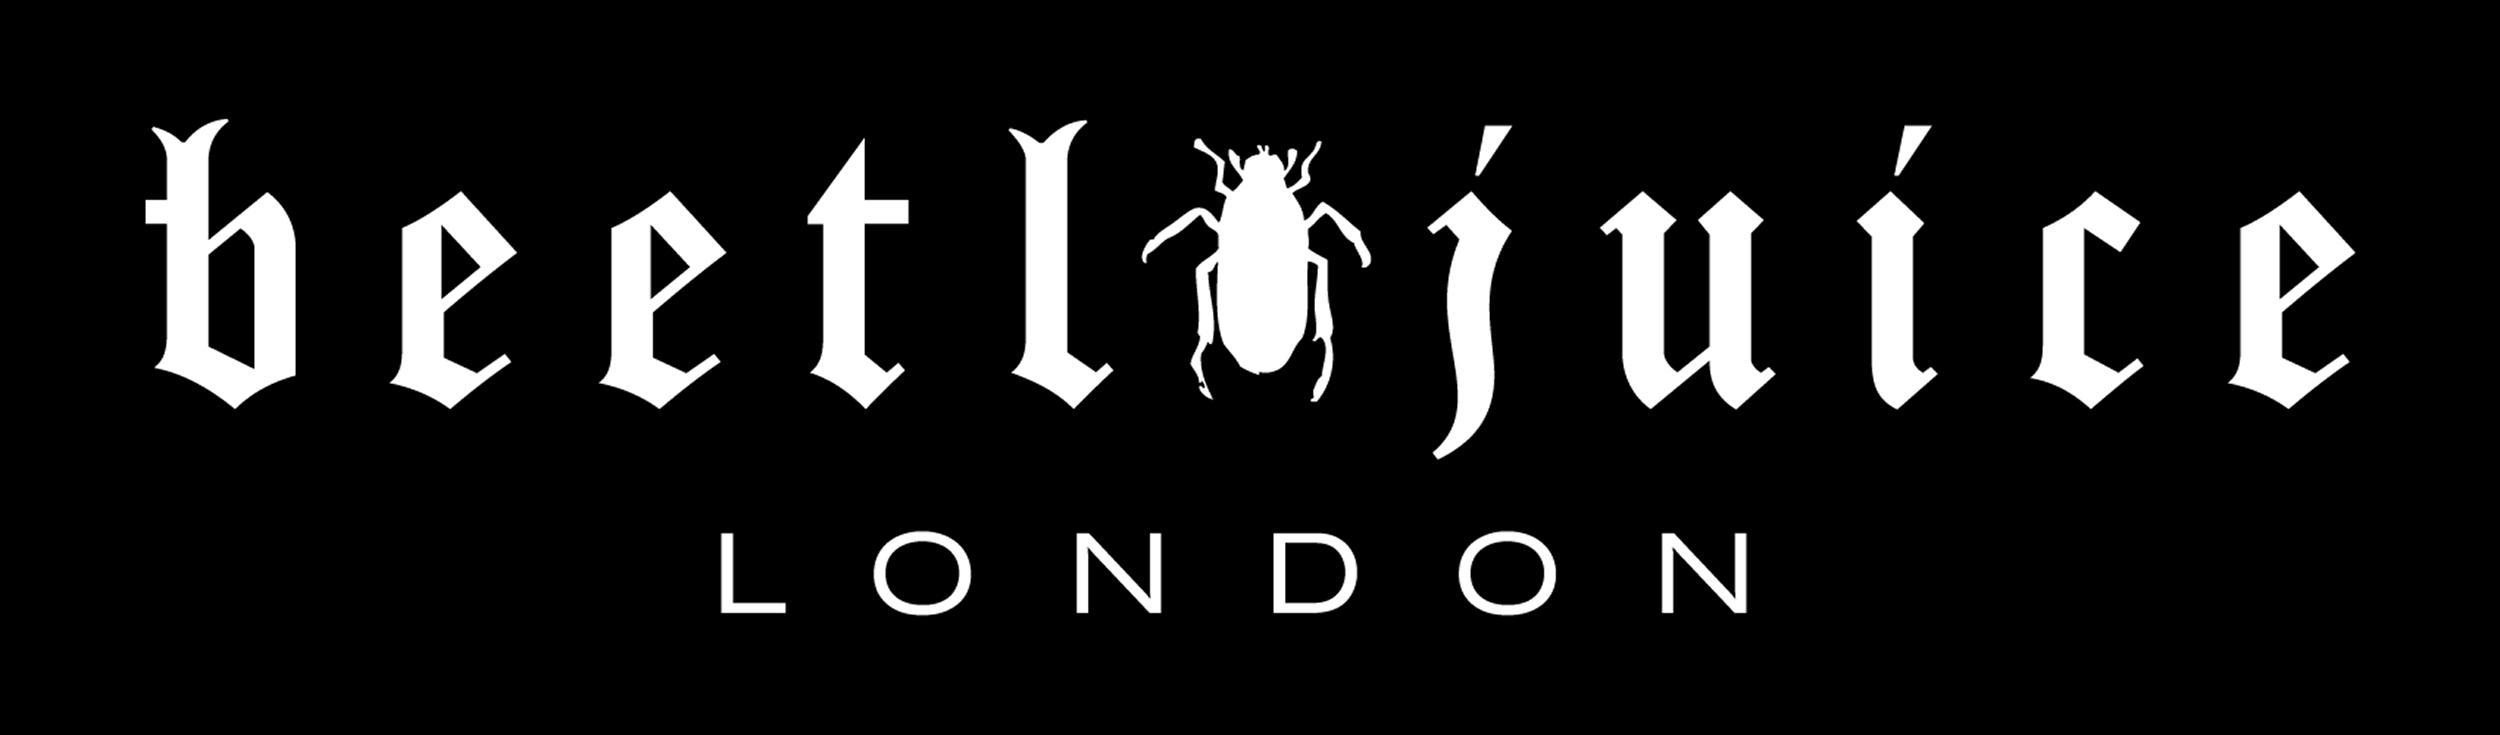 beetlejuice_logo_vector_kod.jpg